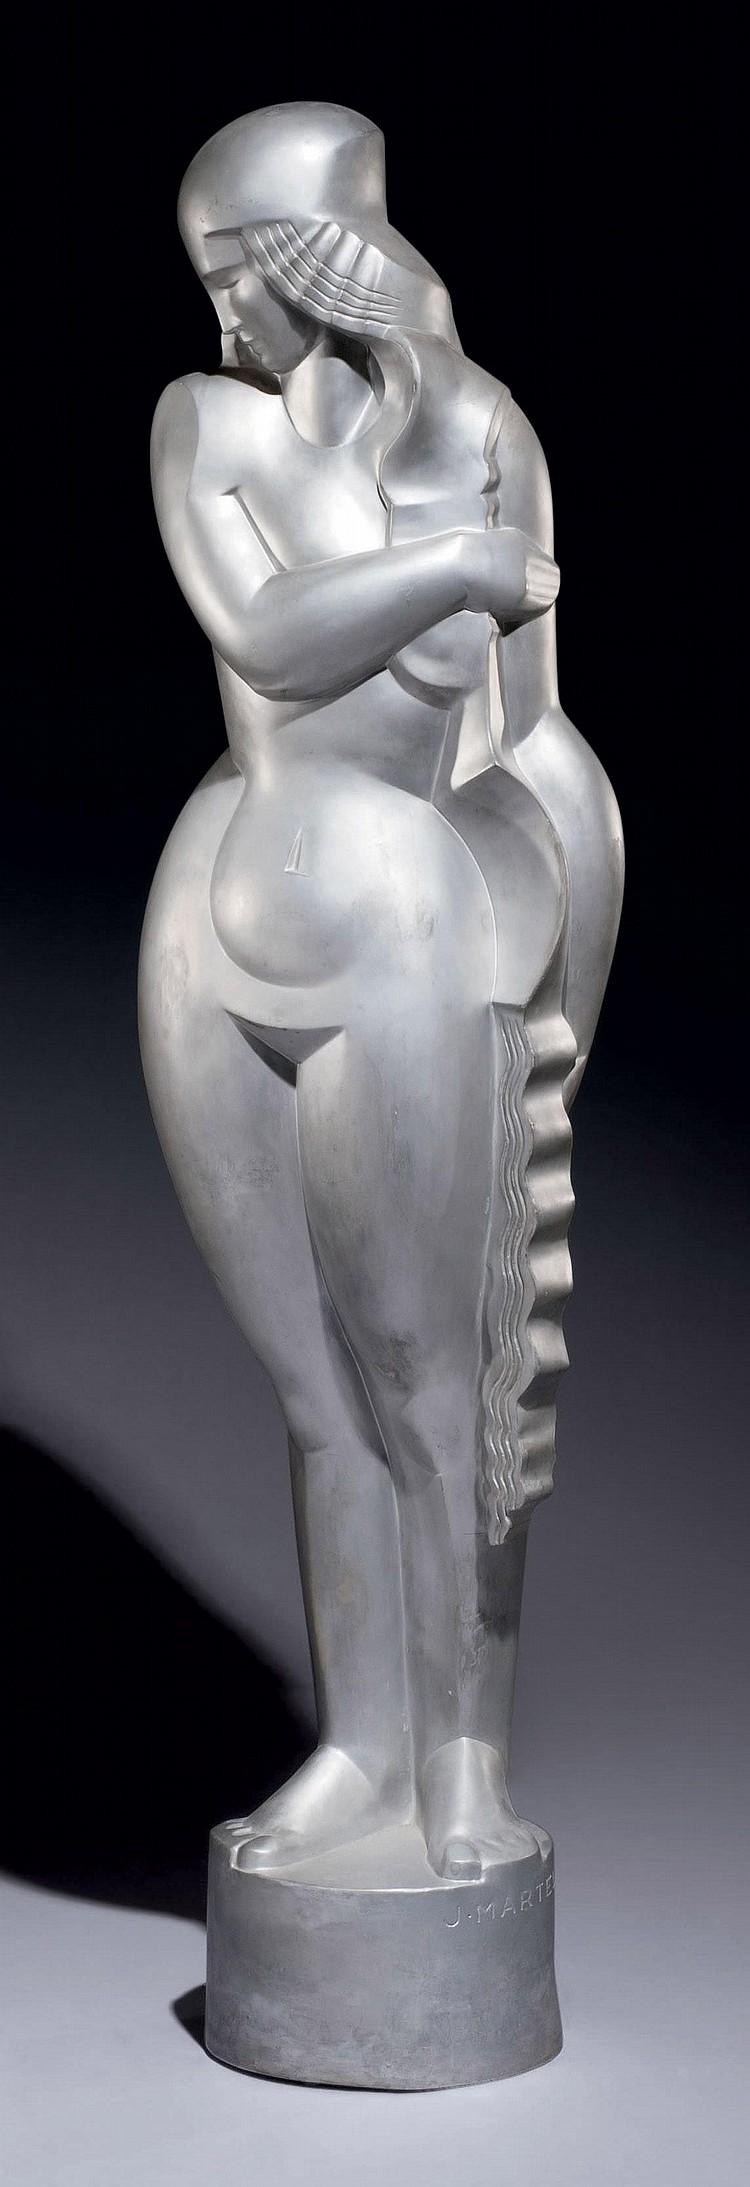 Jan et Joël Martel (1896-1966)